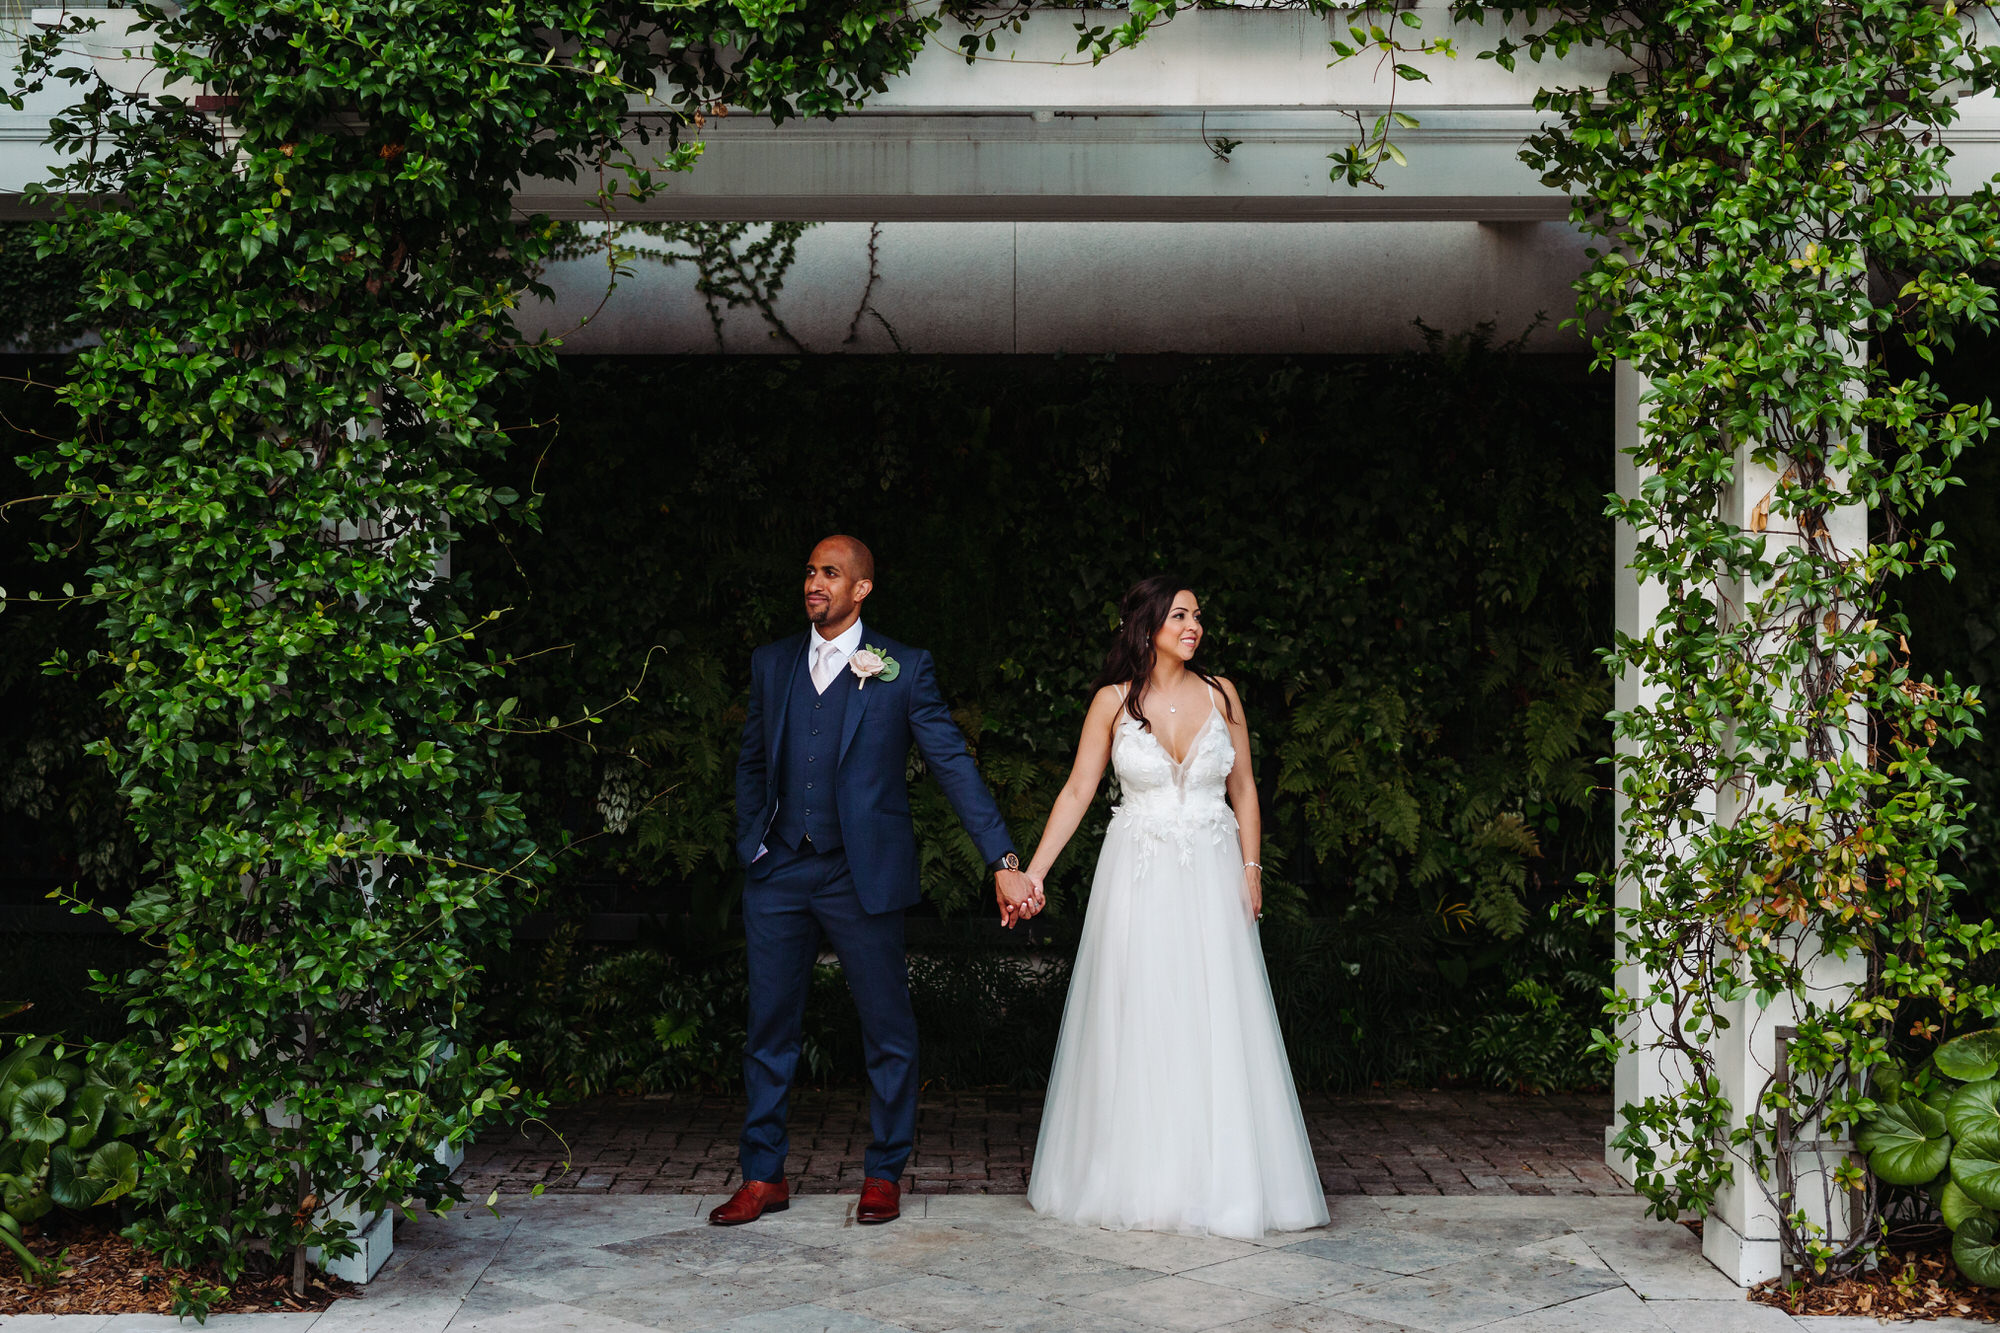 st-lukes-chapel-cannon-green-charleston-wedding-984.JPG